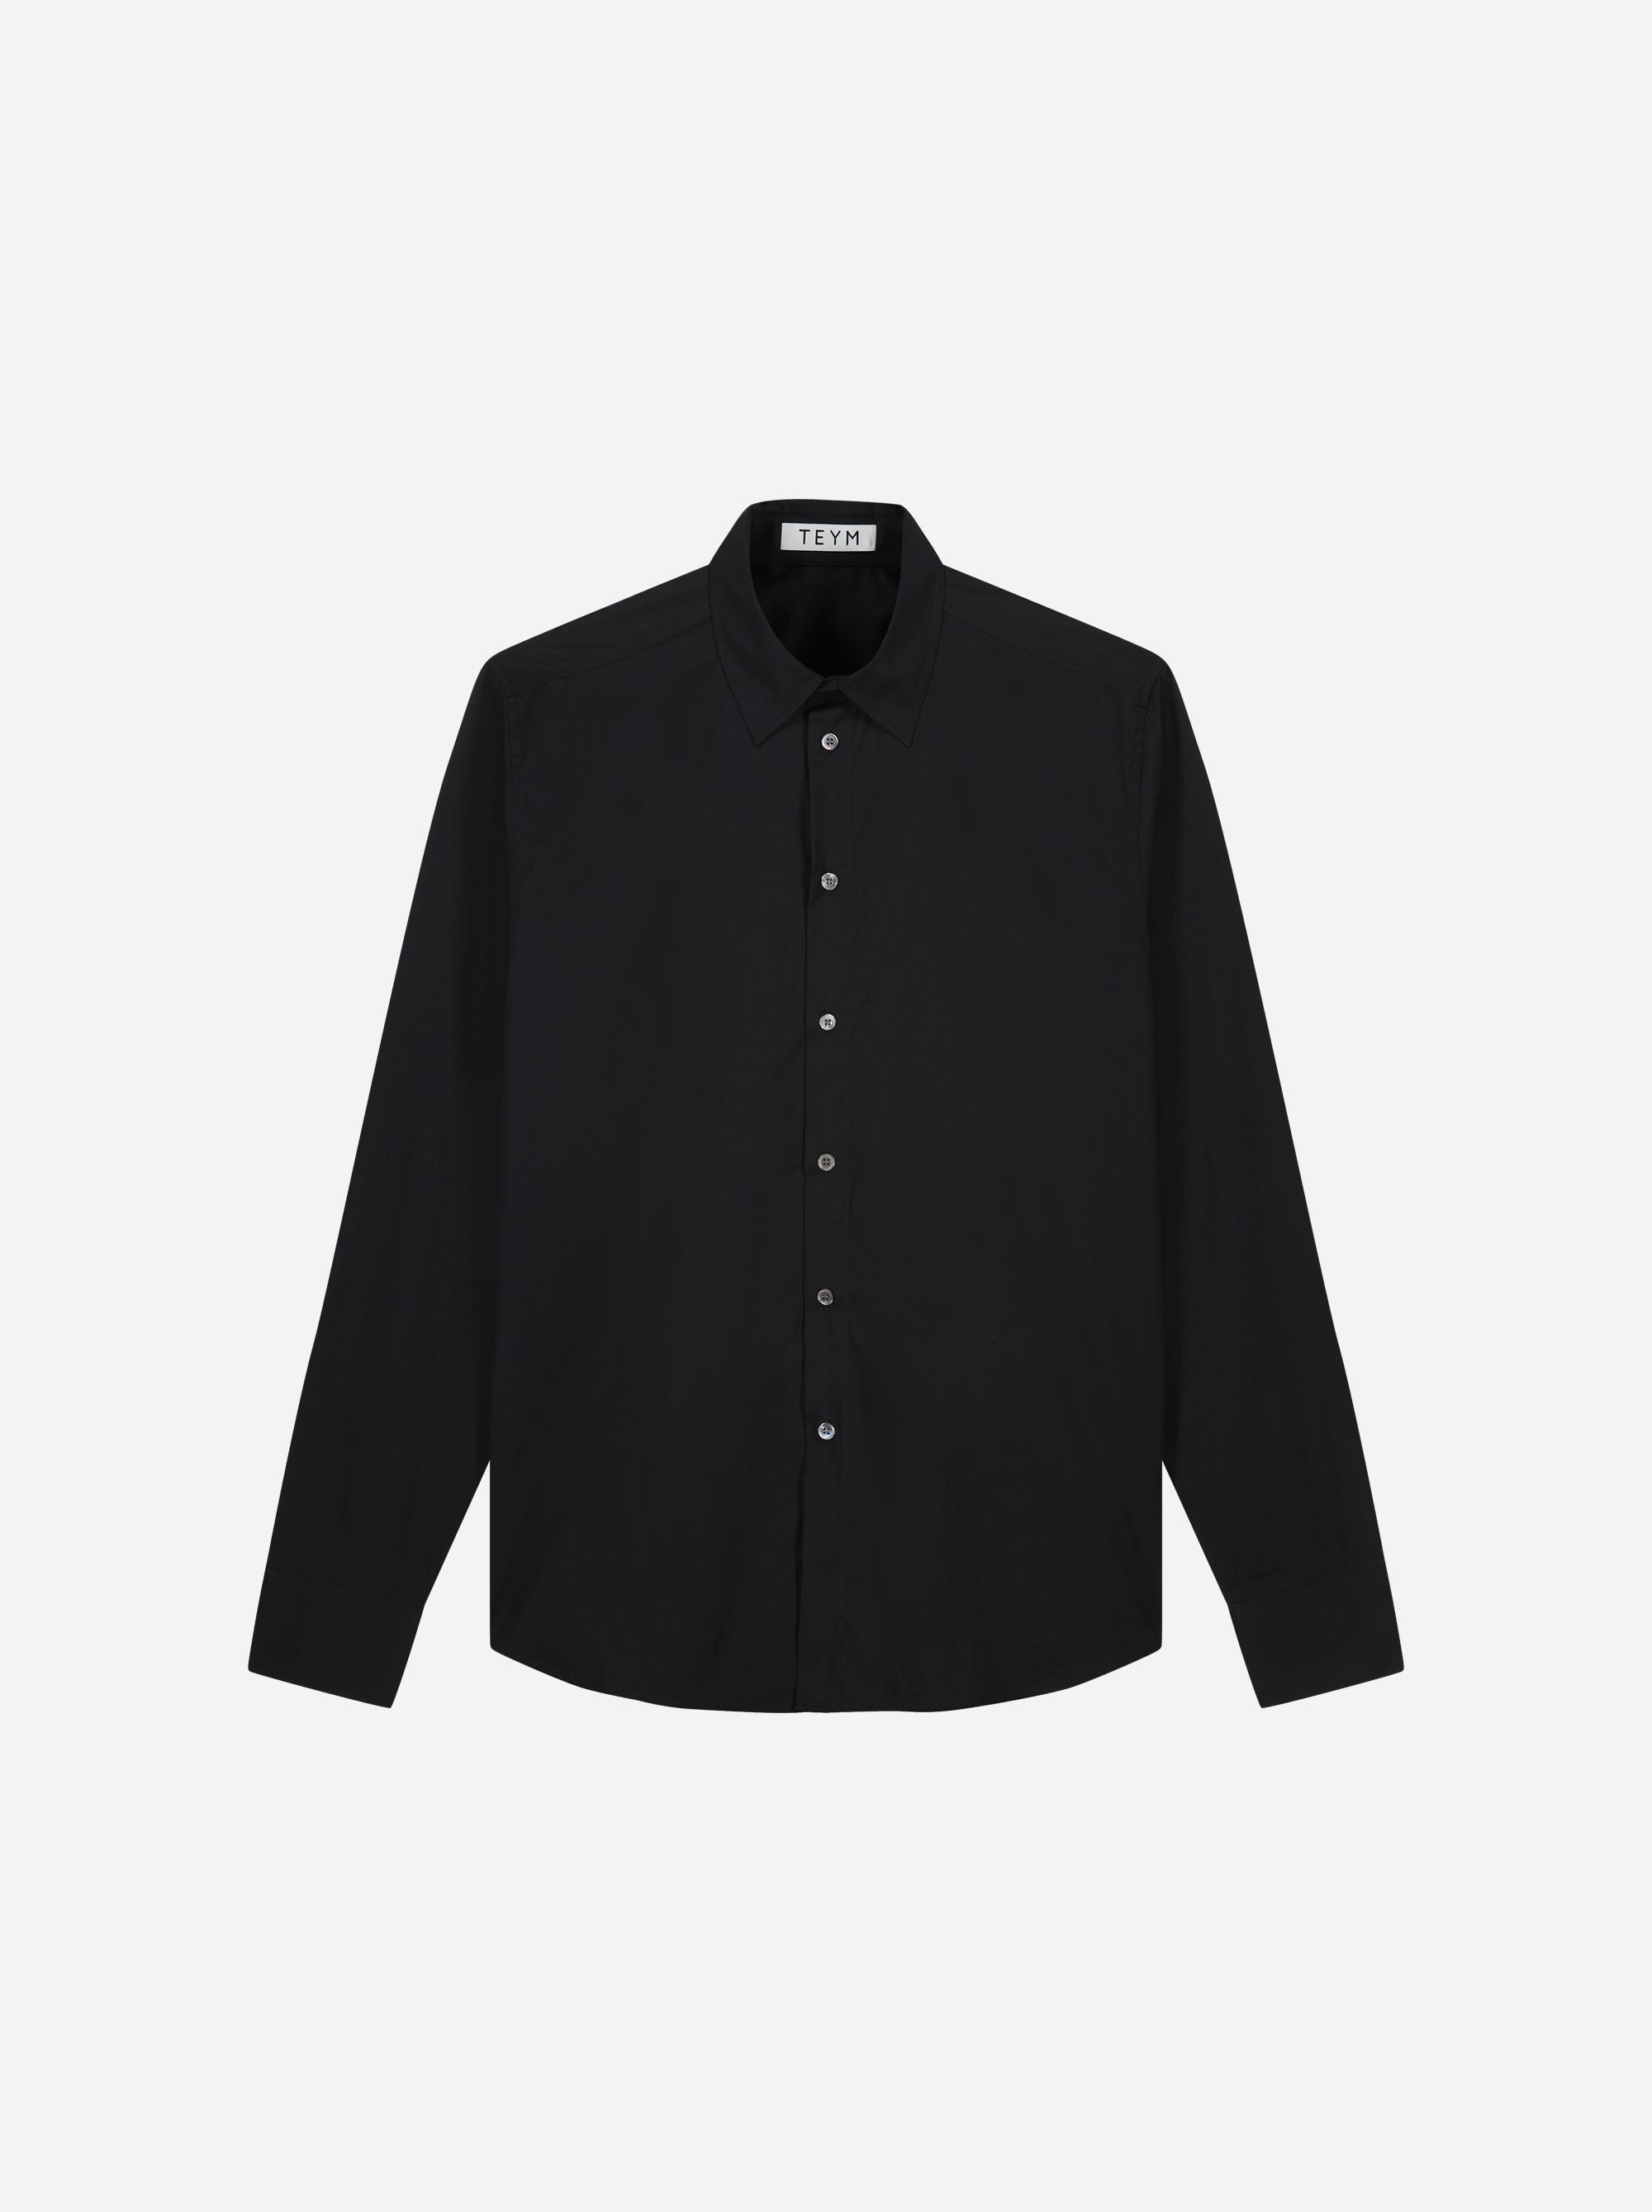 Teym_Shirt_Black_Men_front_1B